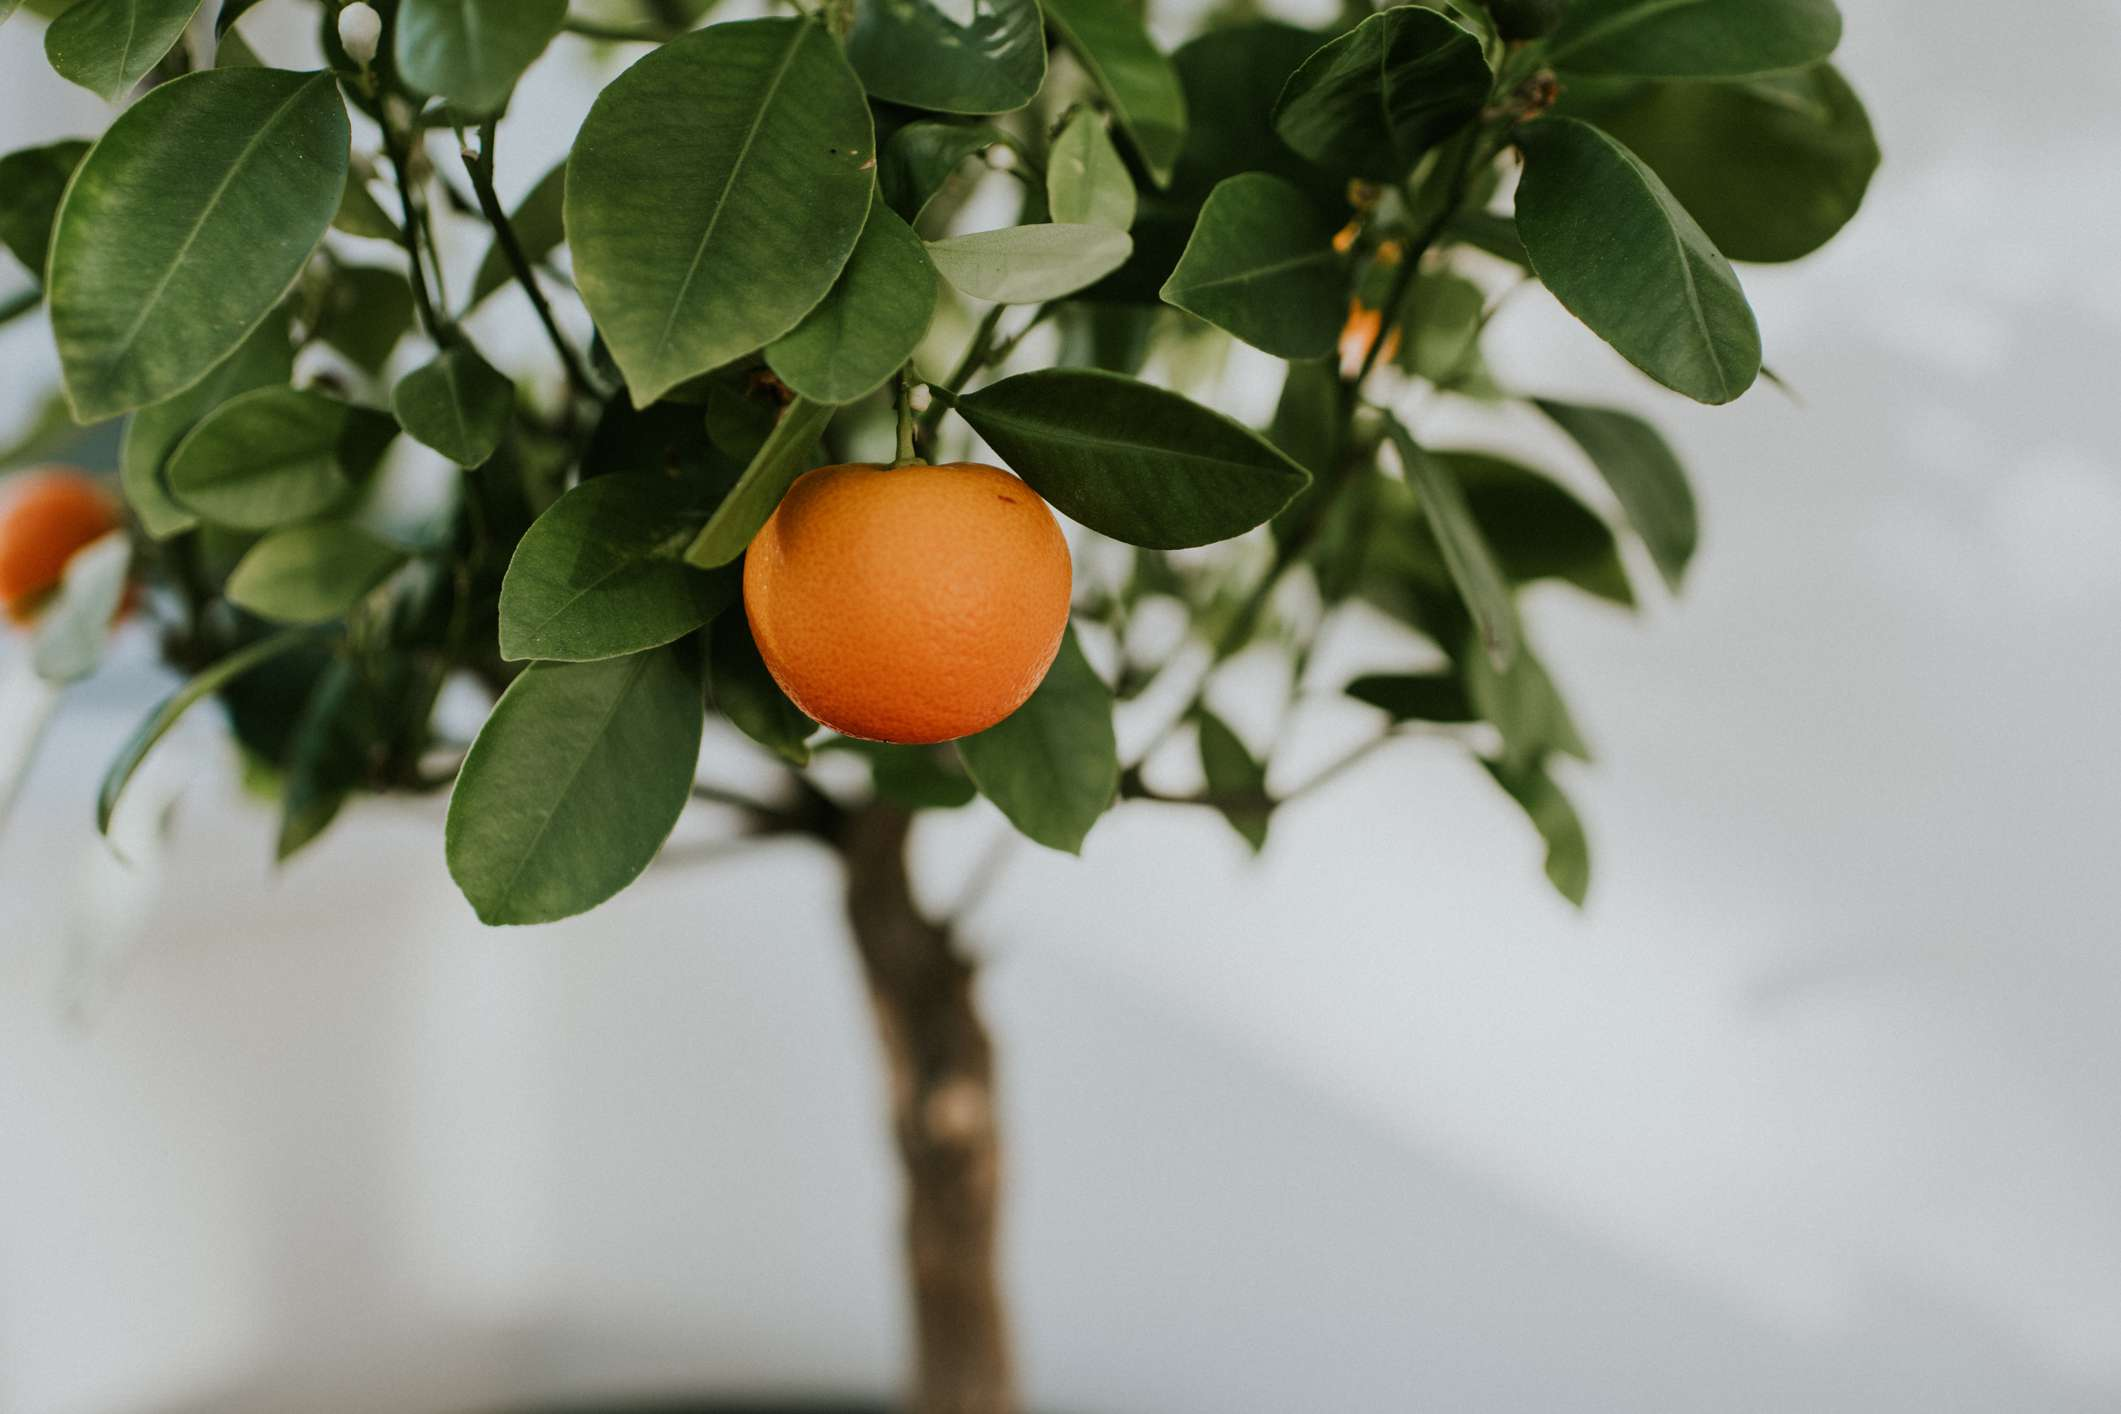 close view of calamondin, dwarf orange tree, with ripe fruit growing indoors